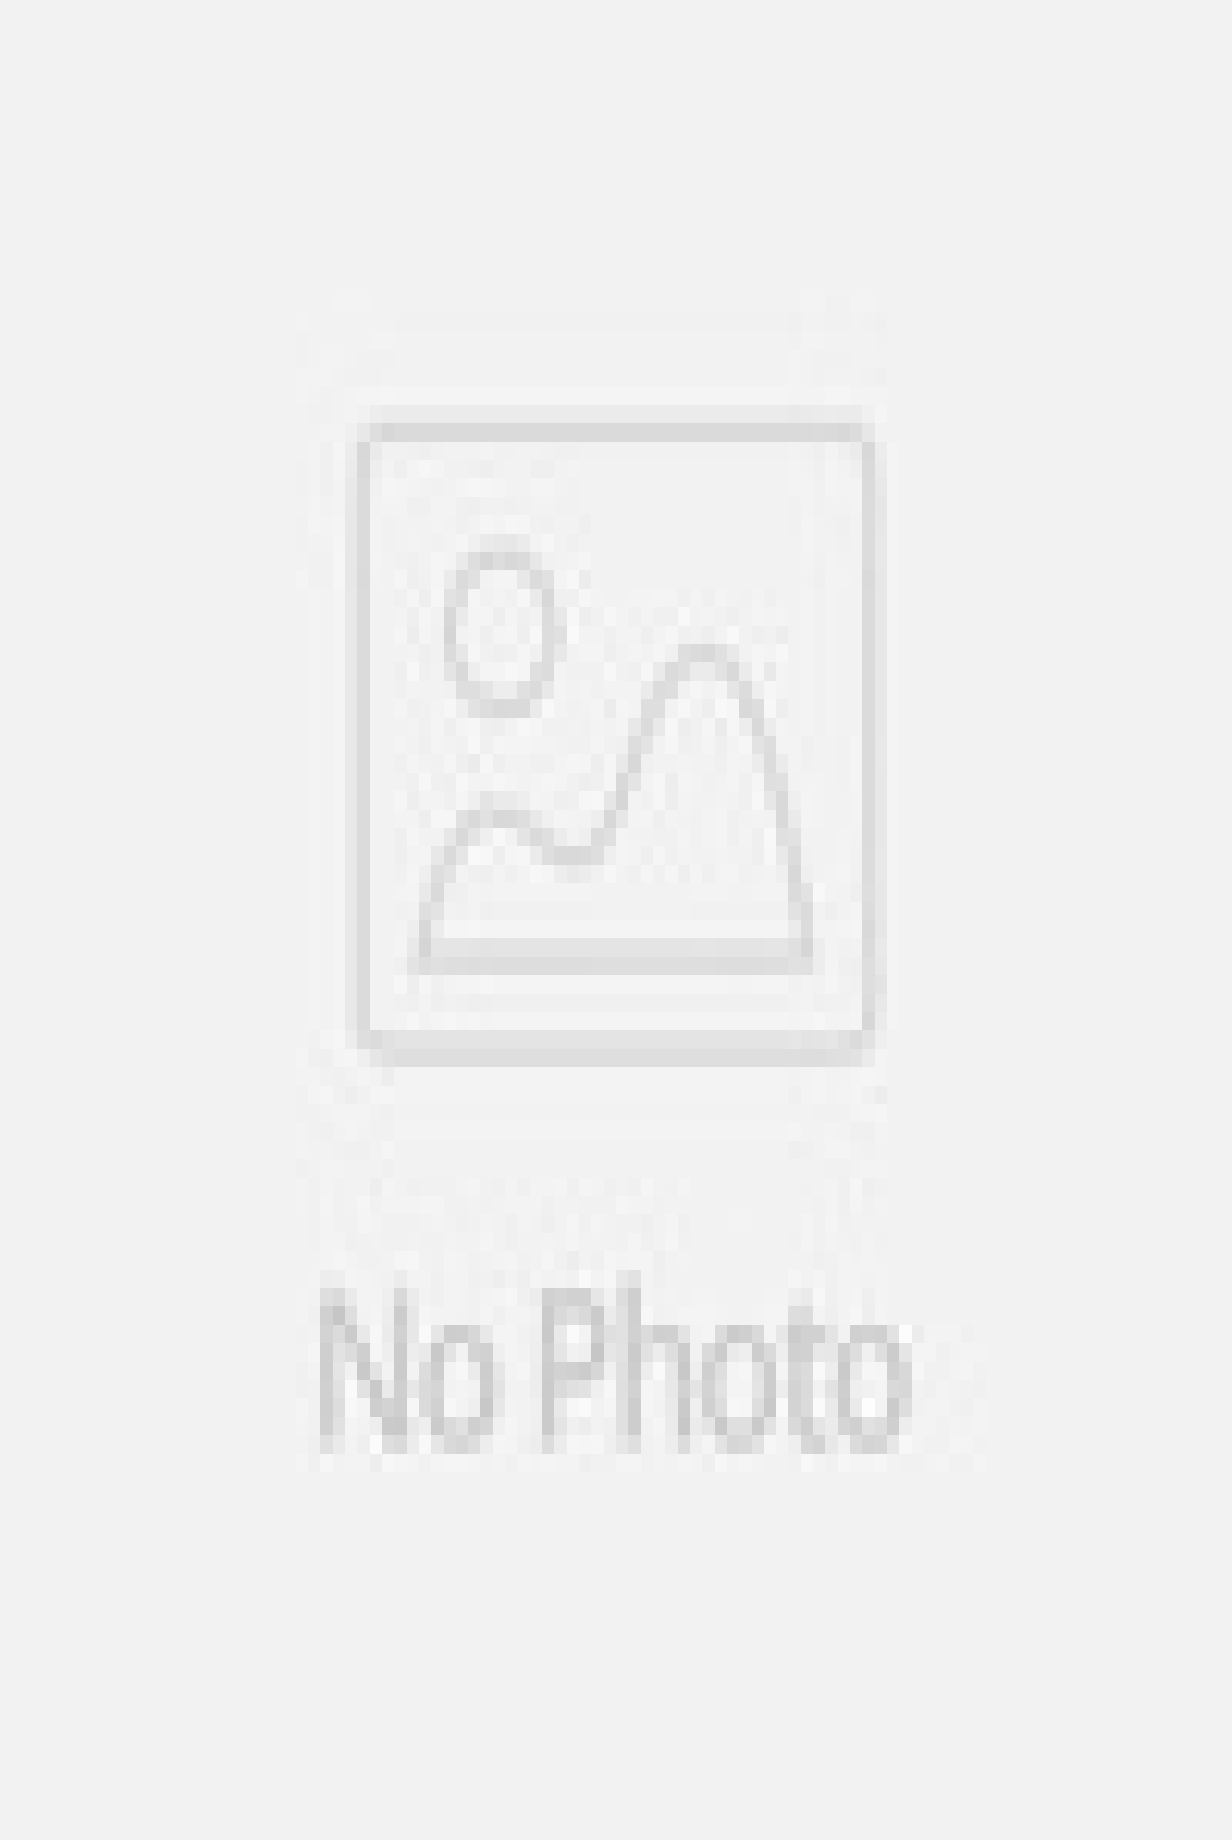 Salt Lamps Bayswater : Rock Salt Crystal Lamp Photo, Detailed about Rock Salt Crystal Lamp Picture on Alibaba.com.